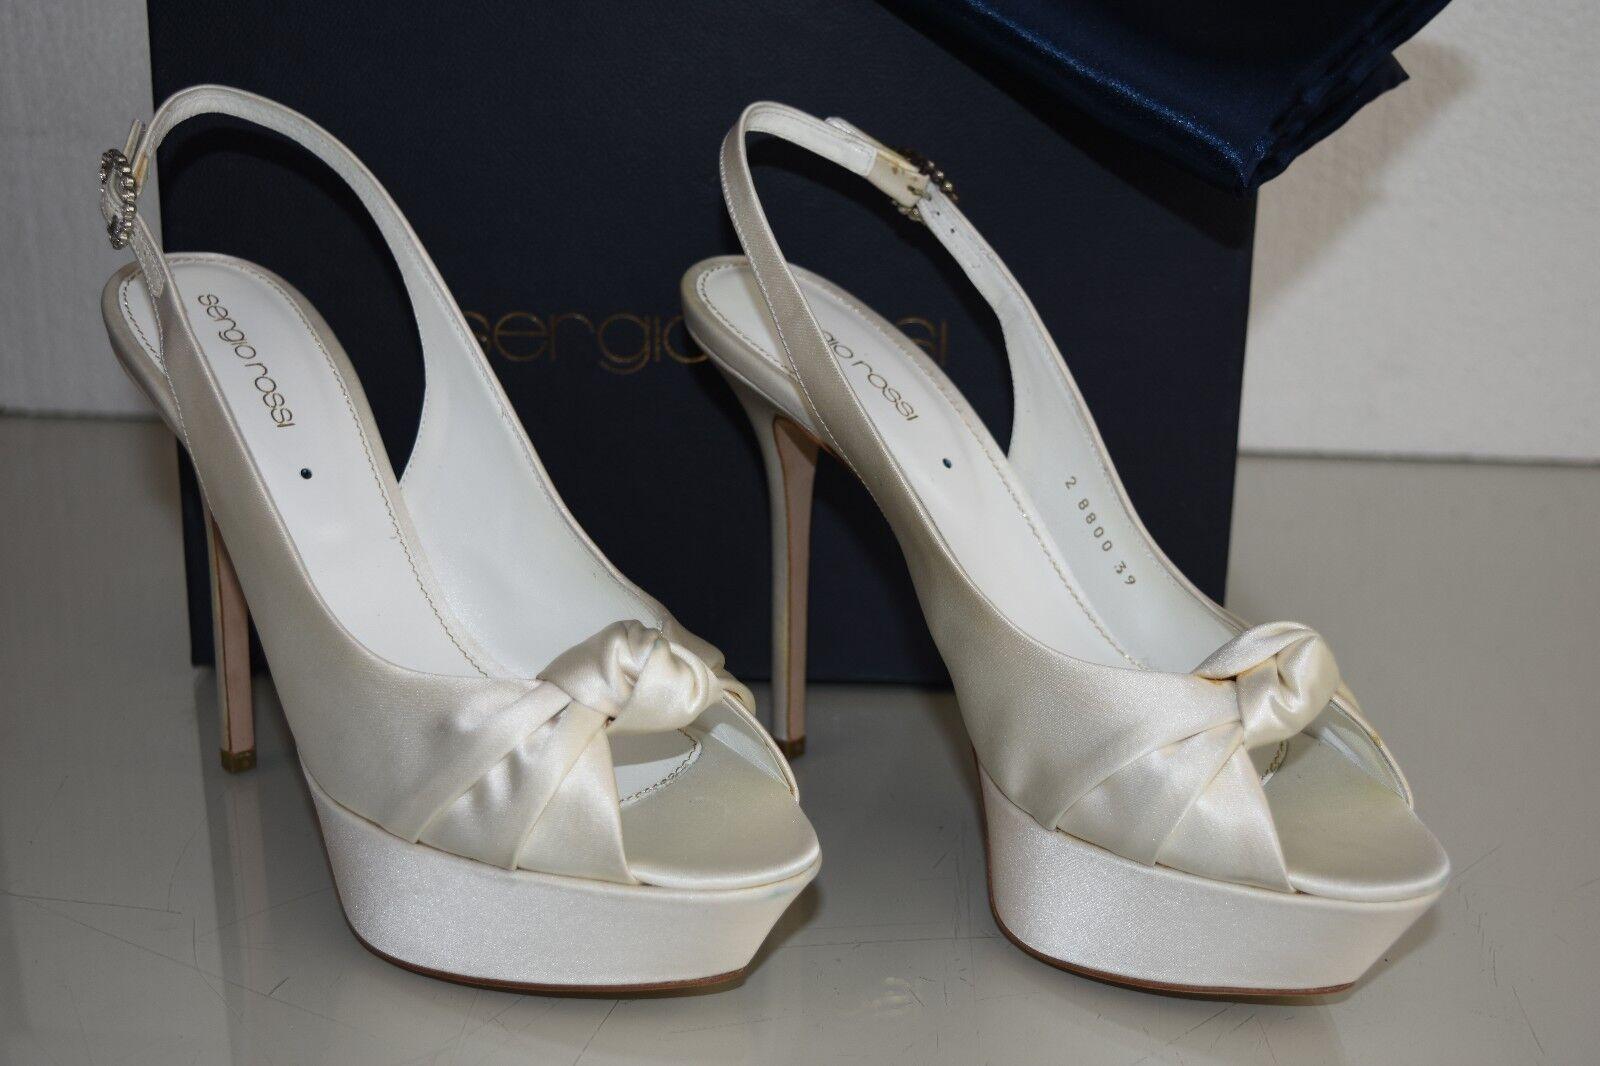 875 New Sergio Rossi Ivory Satin STRASS 39 Wedding Bridal Bridal Wedding Platform   e3463f